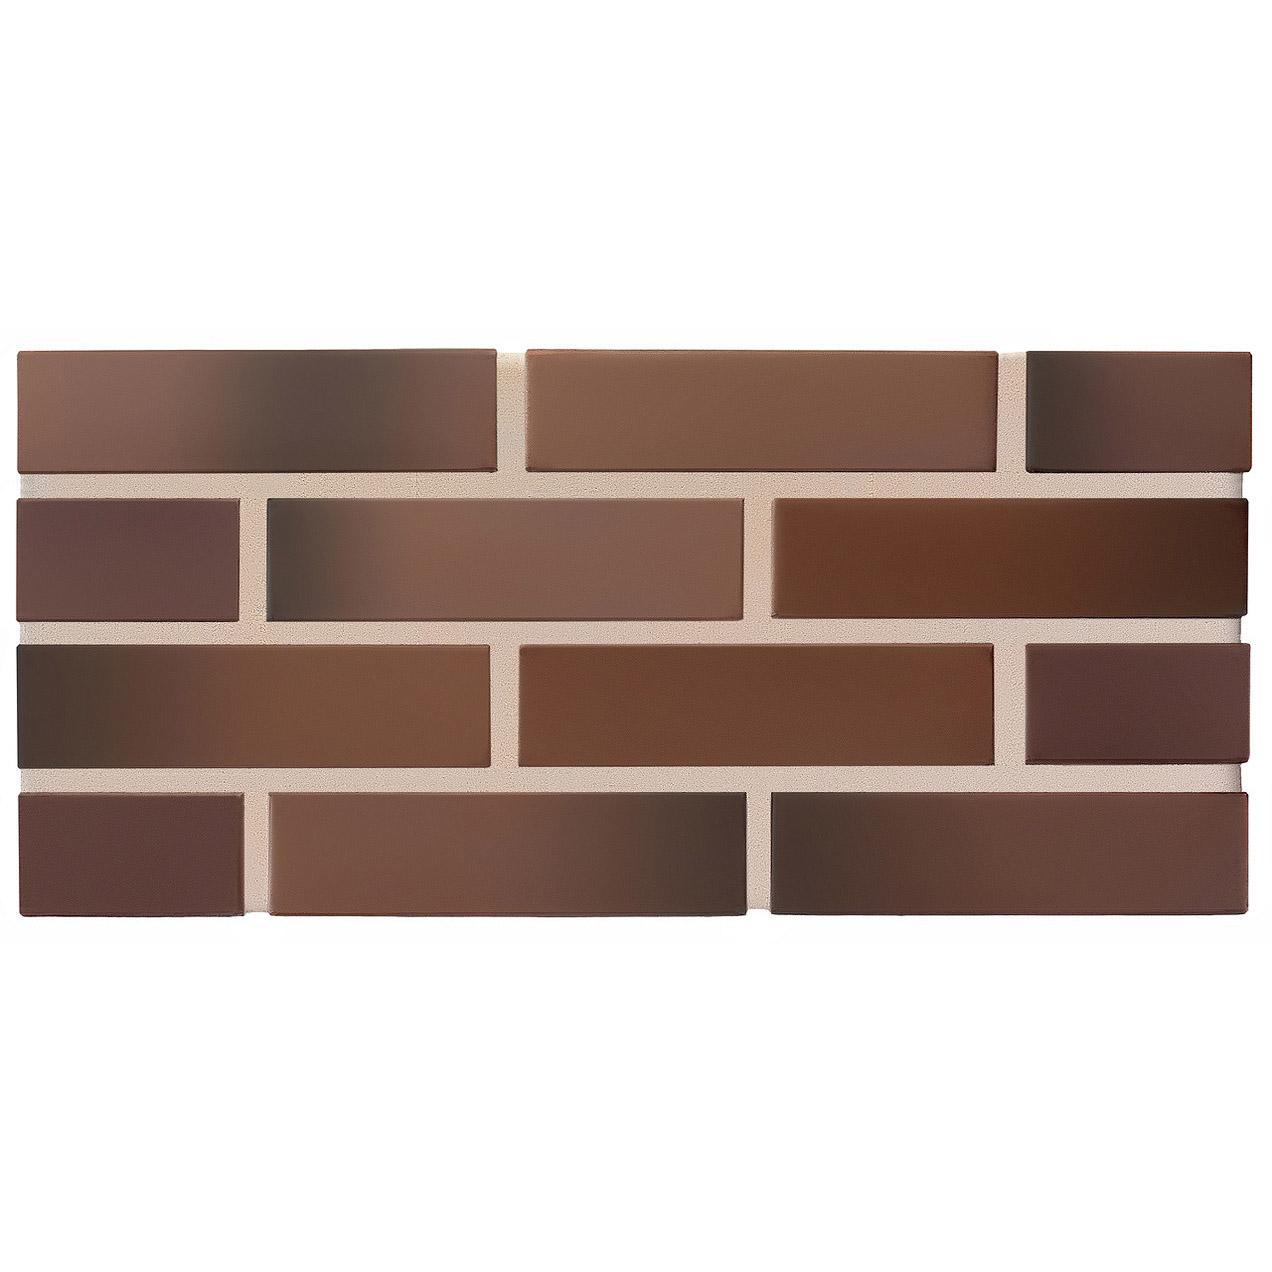 КС-керамик Рочестер флеш темный шоколад кирпич пустотелый